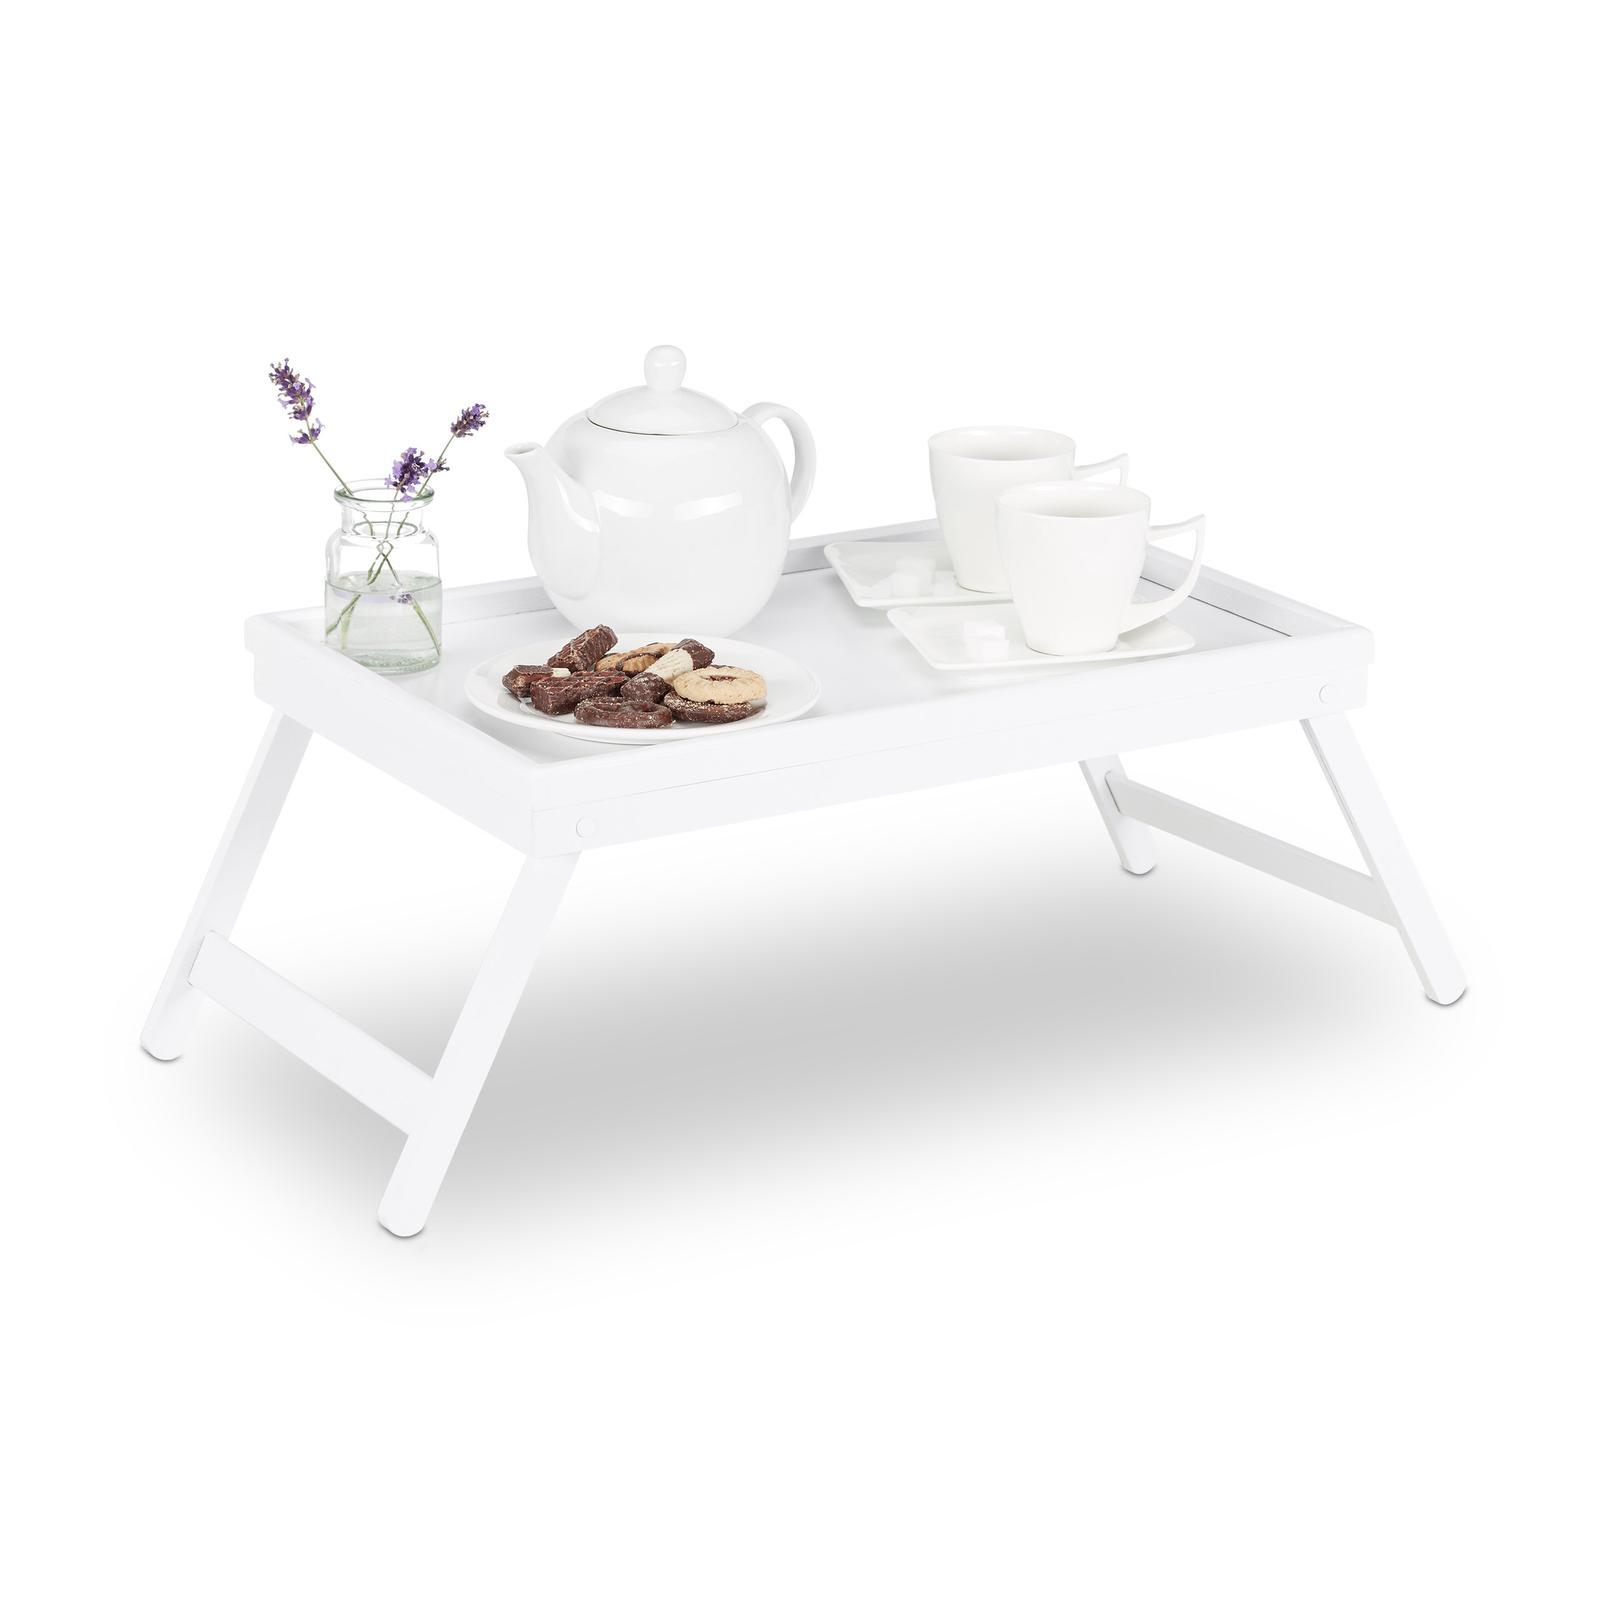 Stolík pre notebook, raňajkové stolíky - Obrázok č. 21